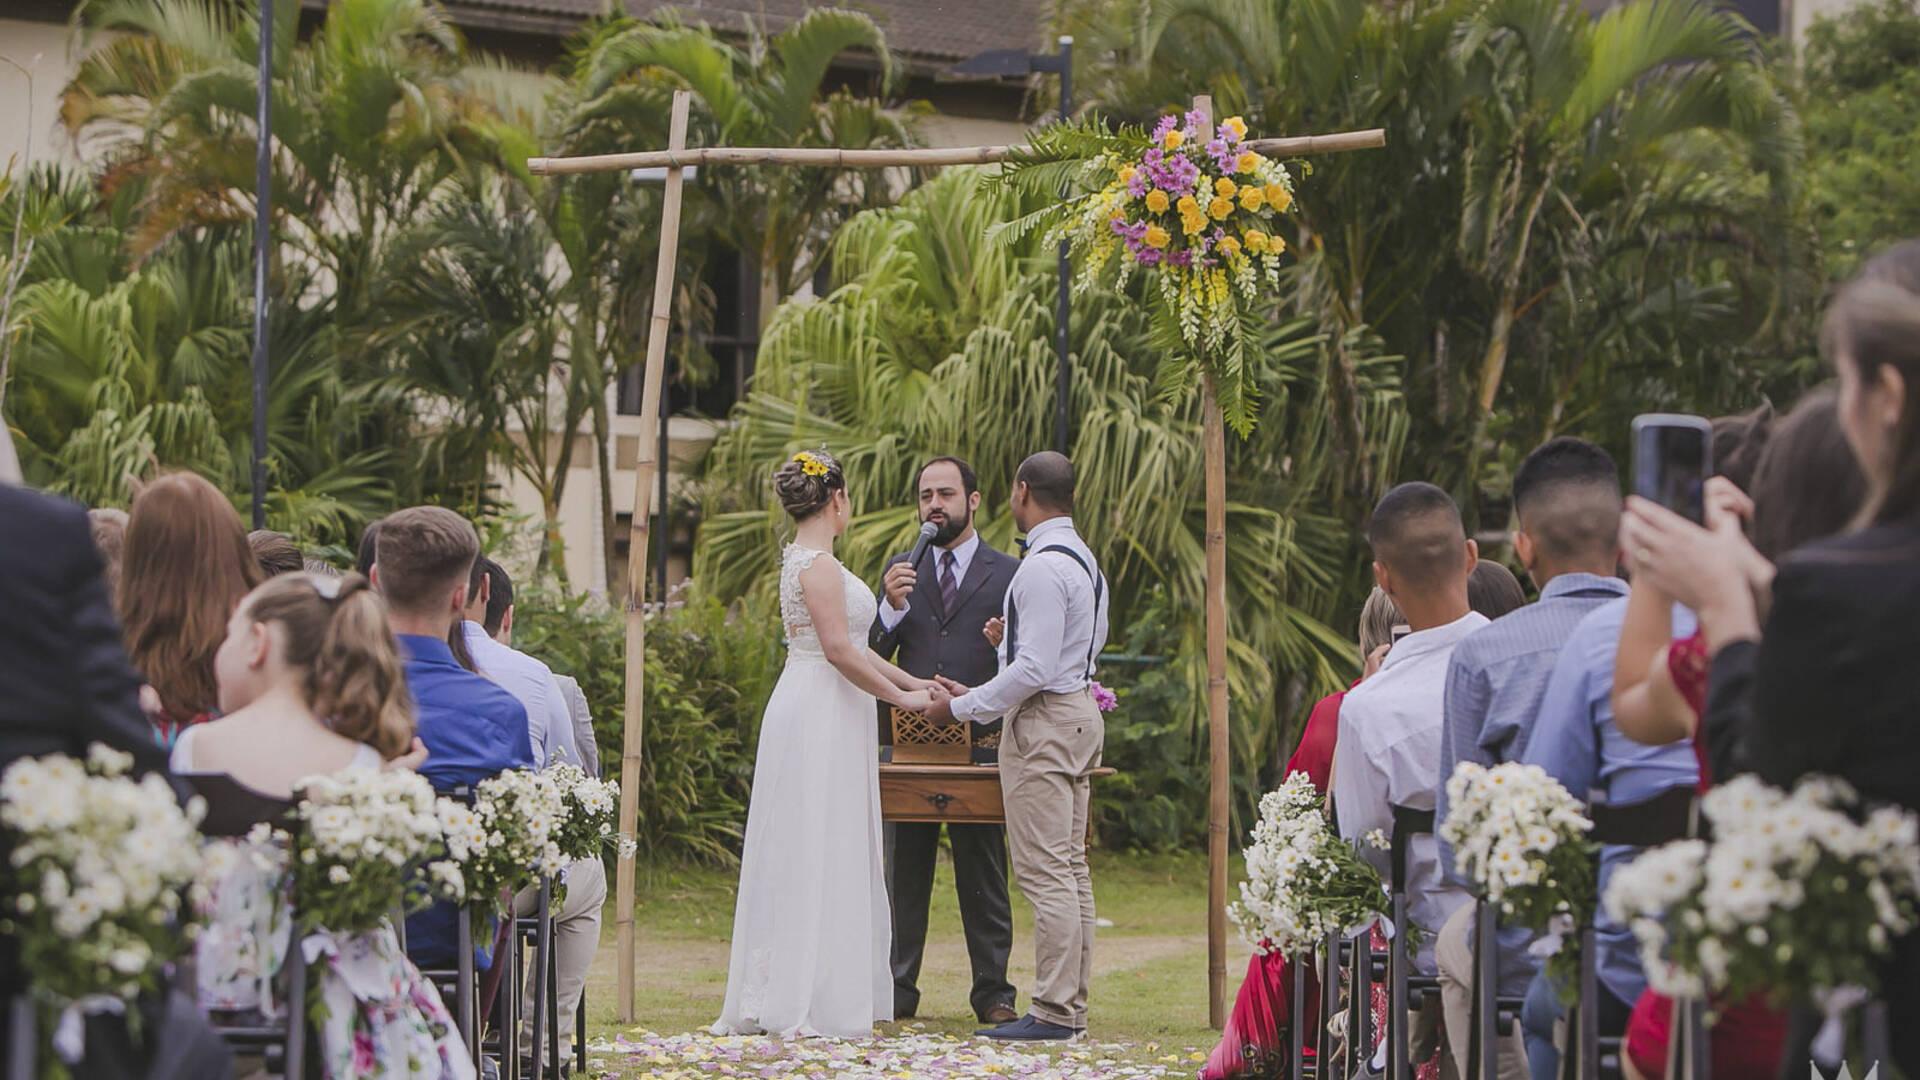 Casamento de Cibele e Jair